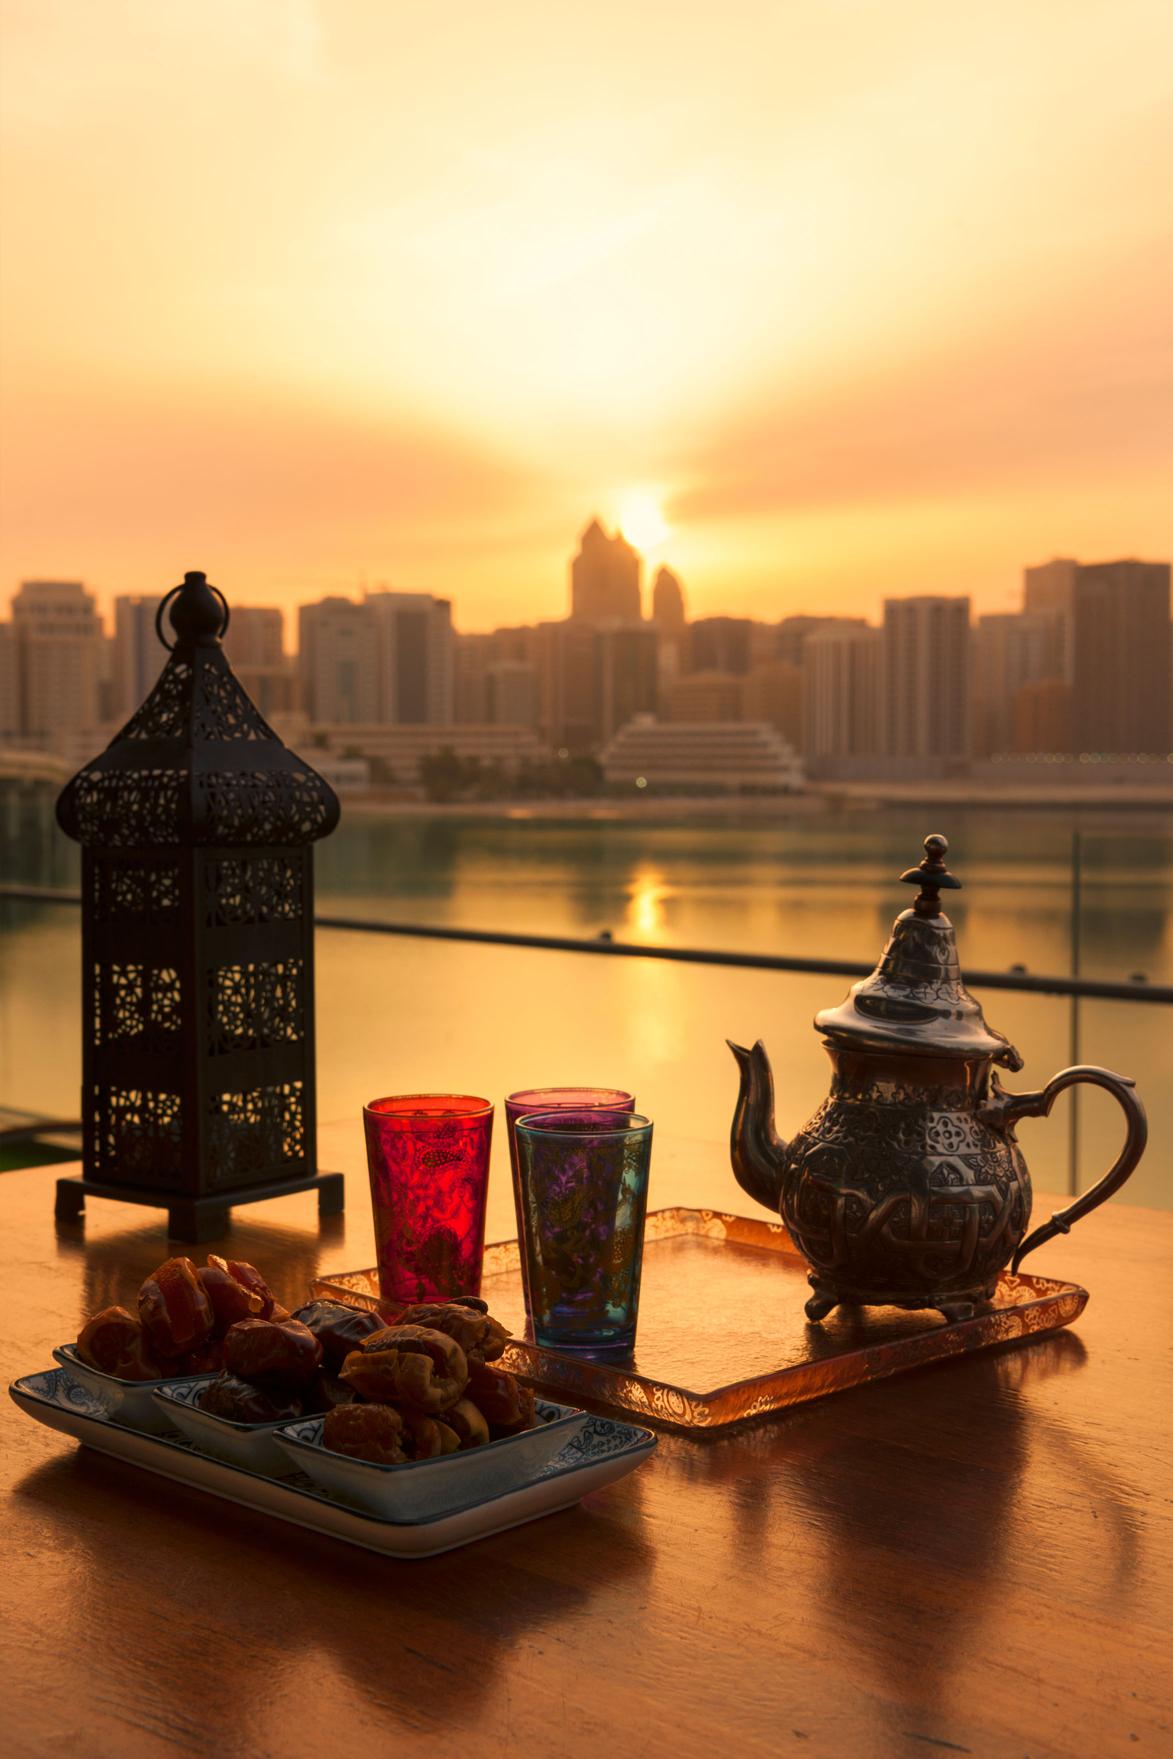 Evening Sunset in Abu Dhabi